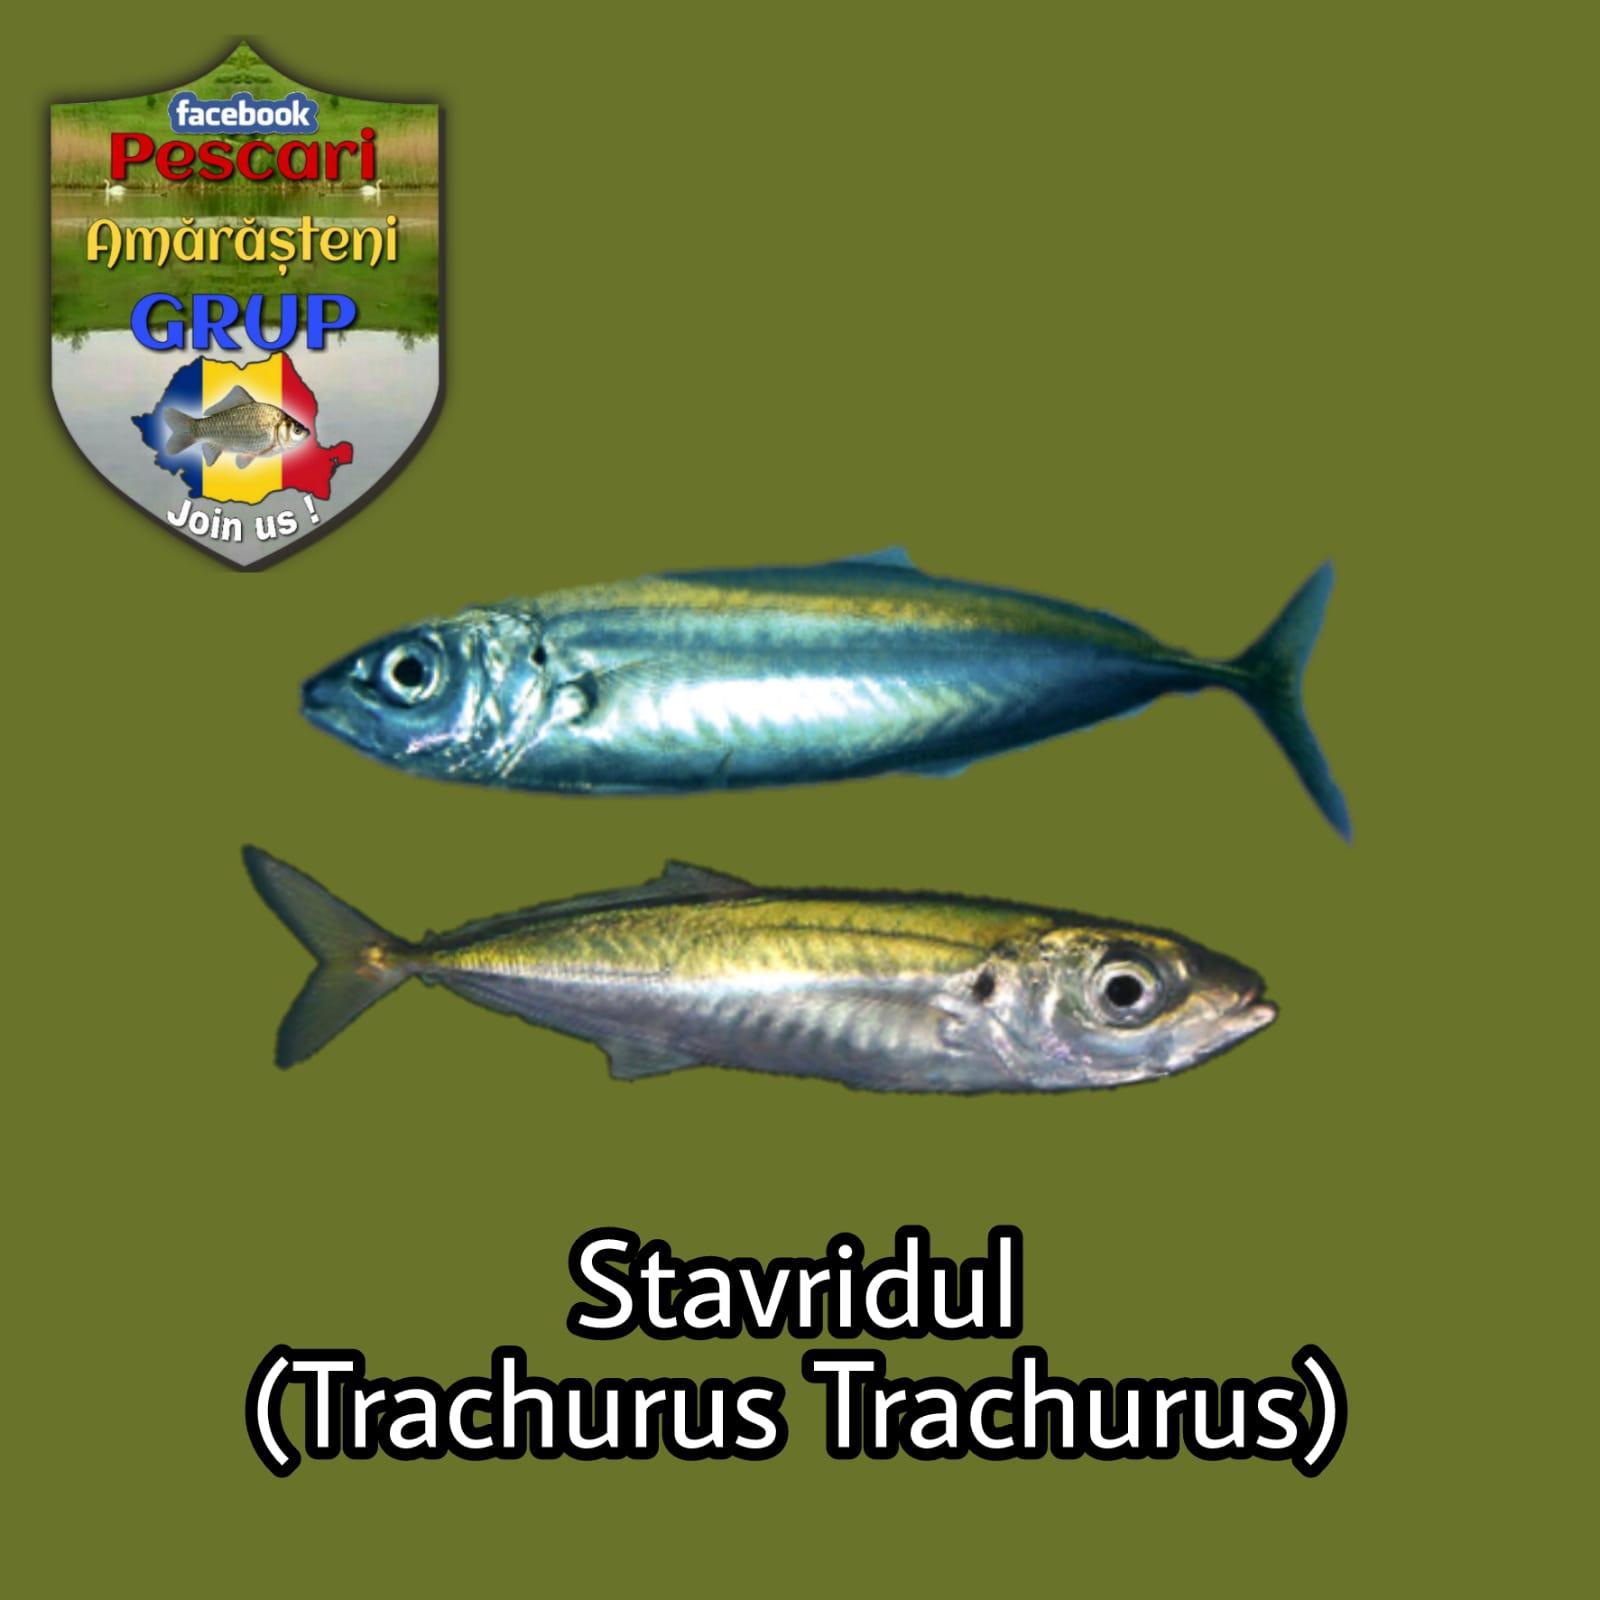 Stavridul (Trachurus trachurus)